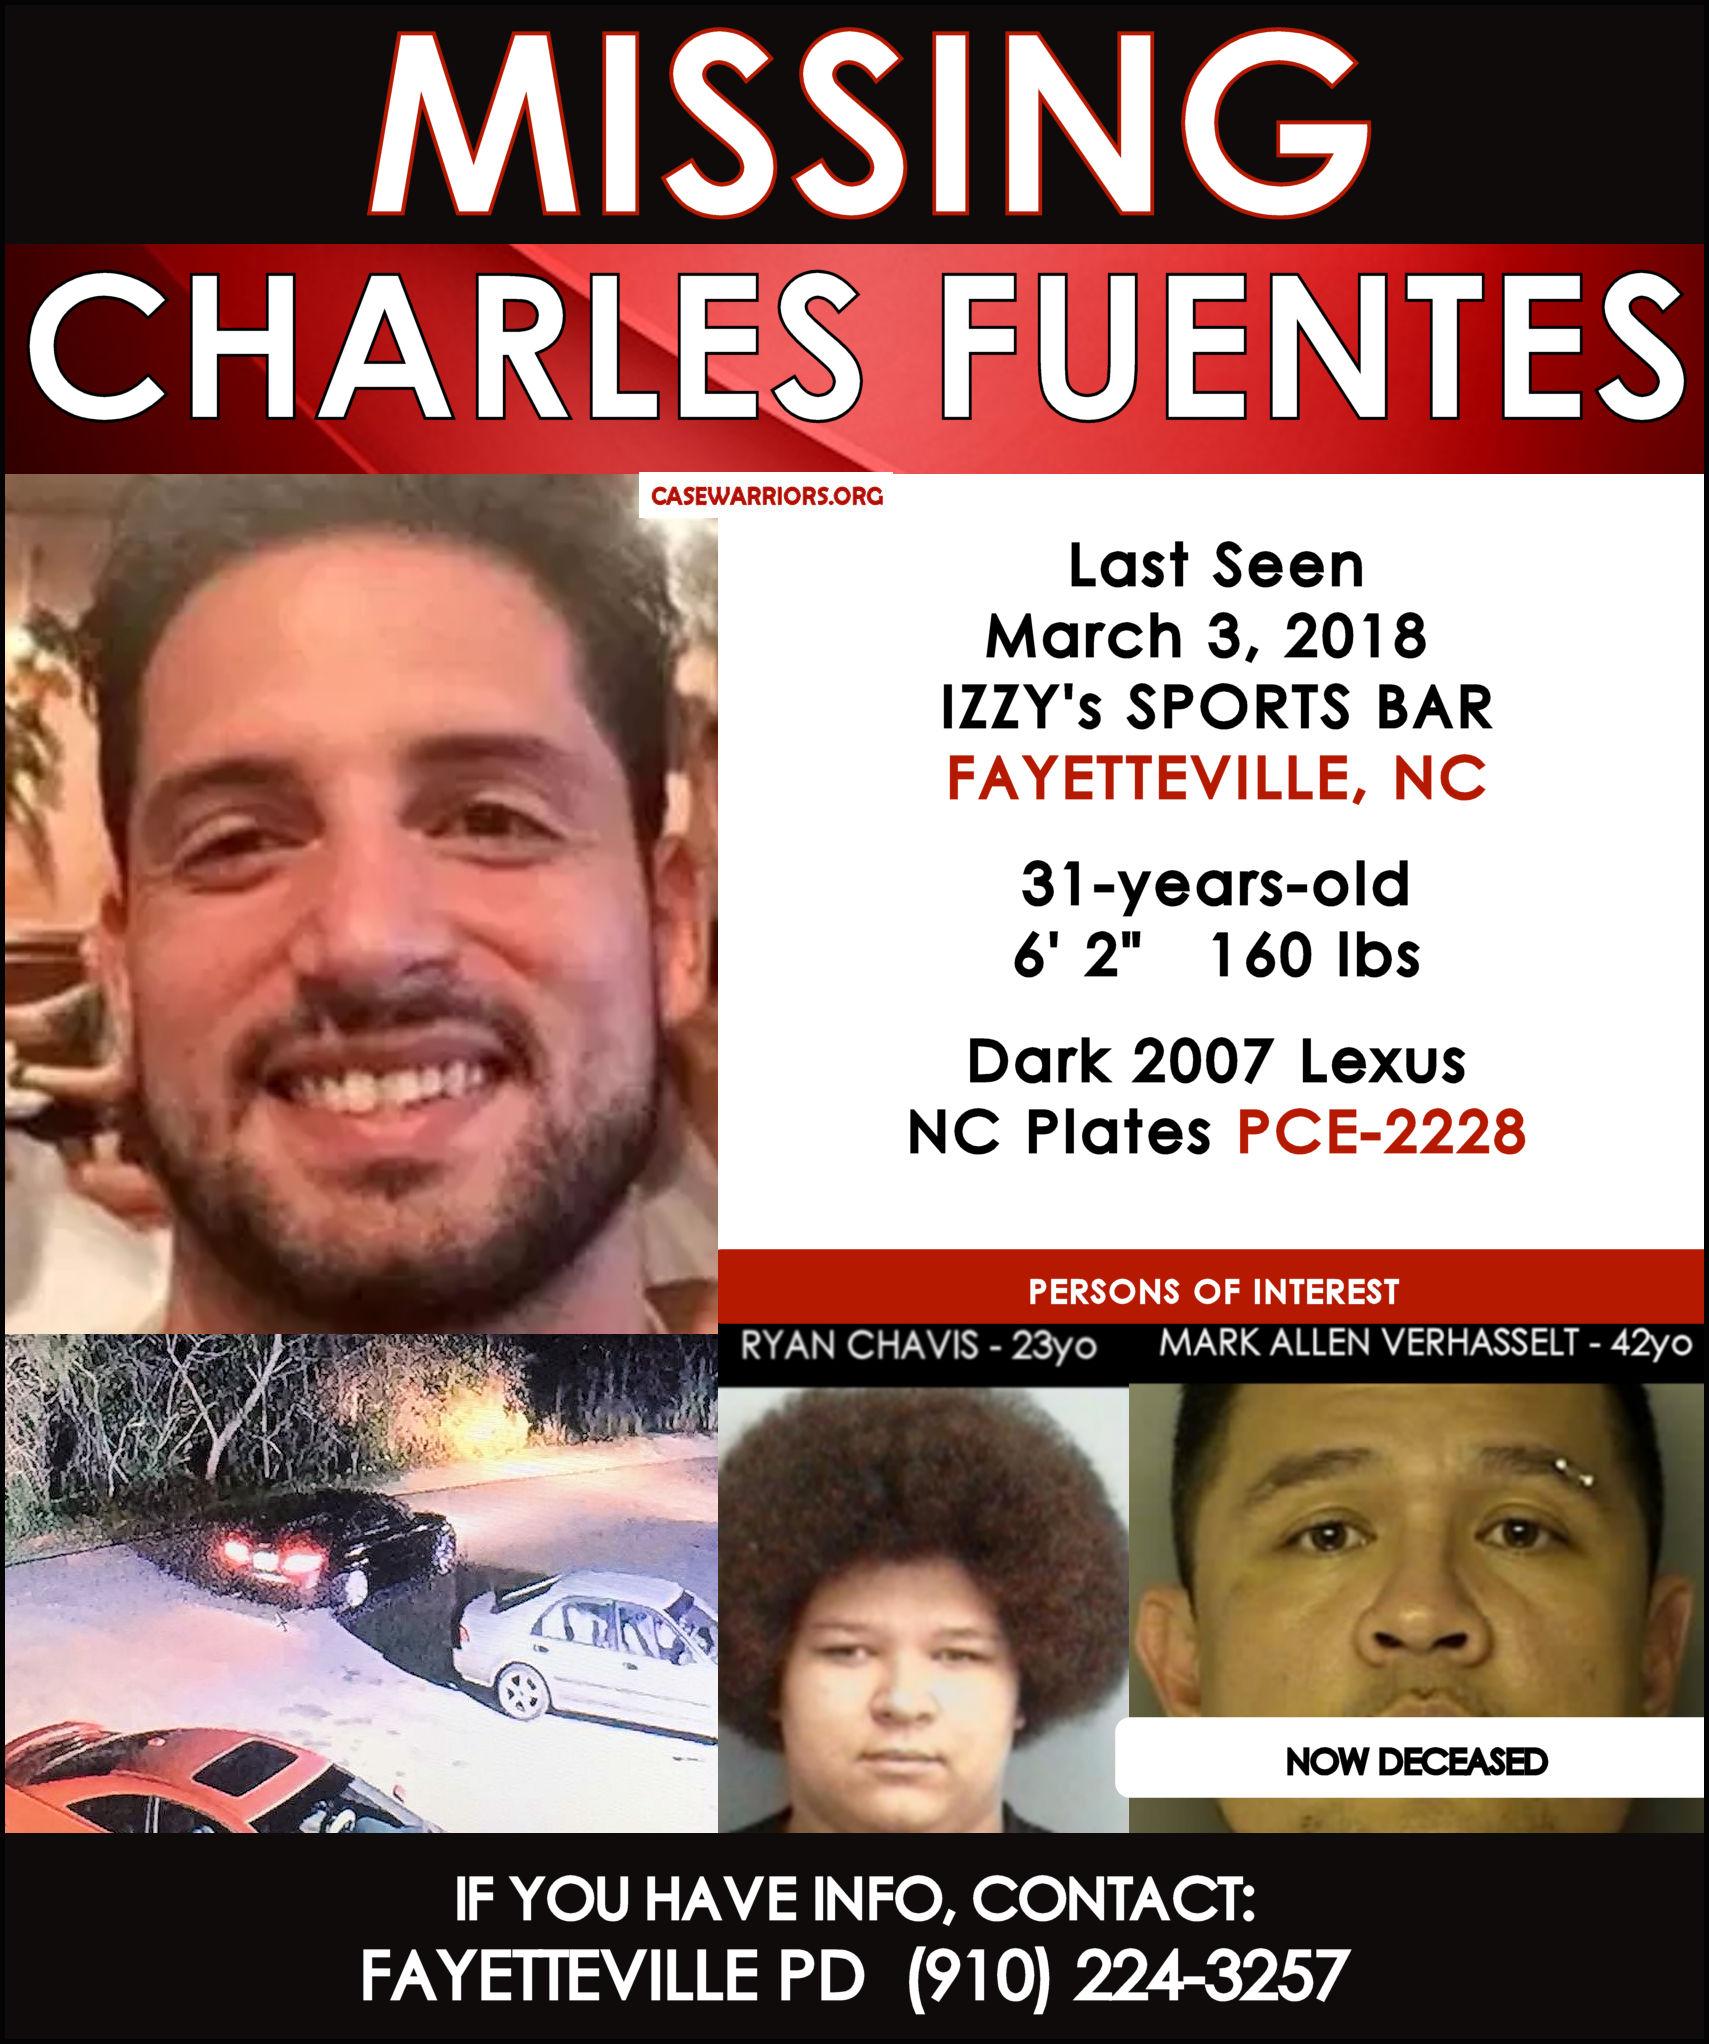 CHARLES FUENTES